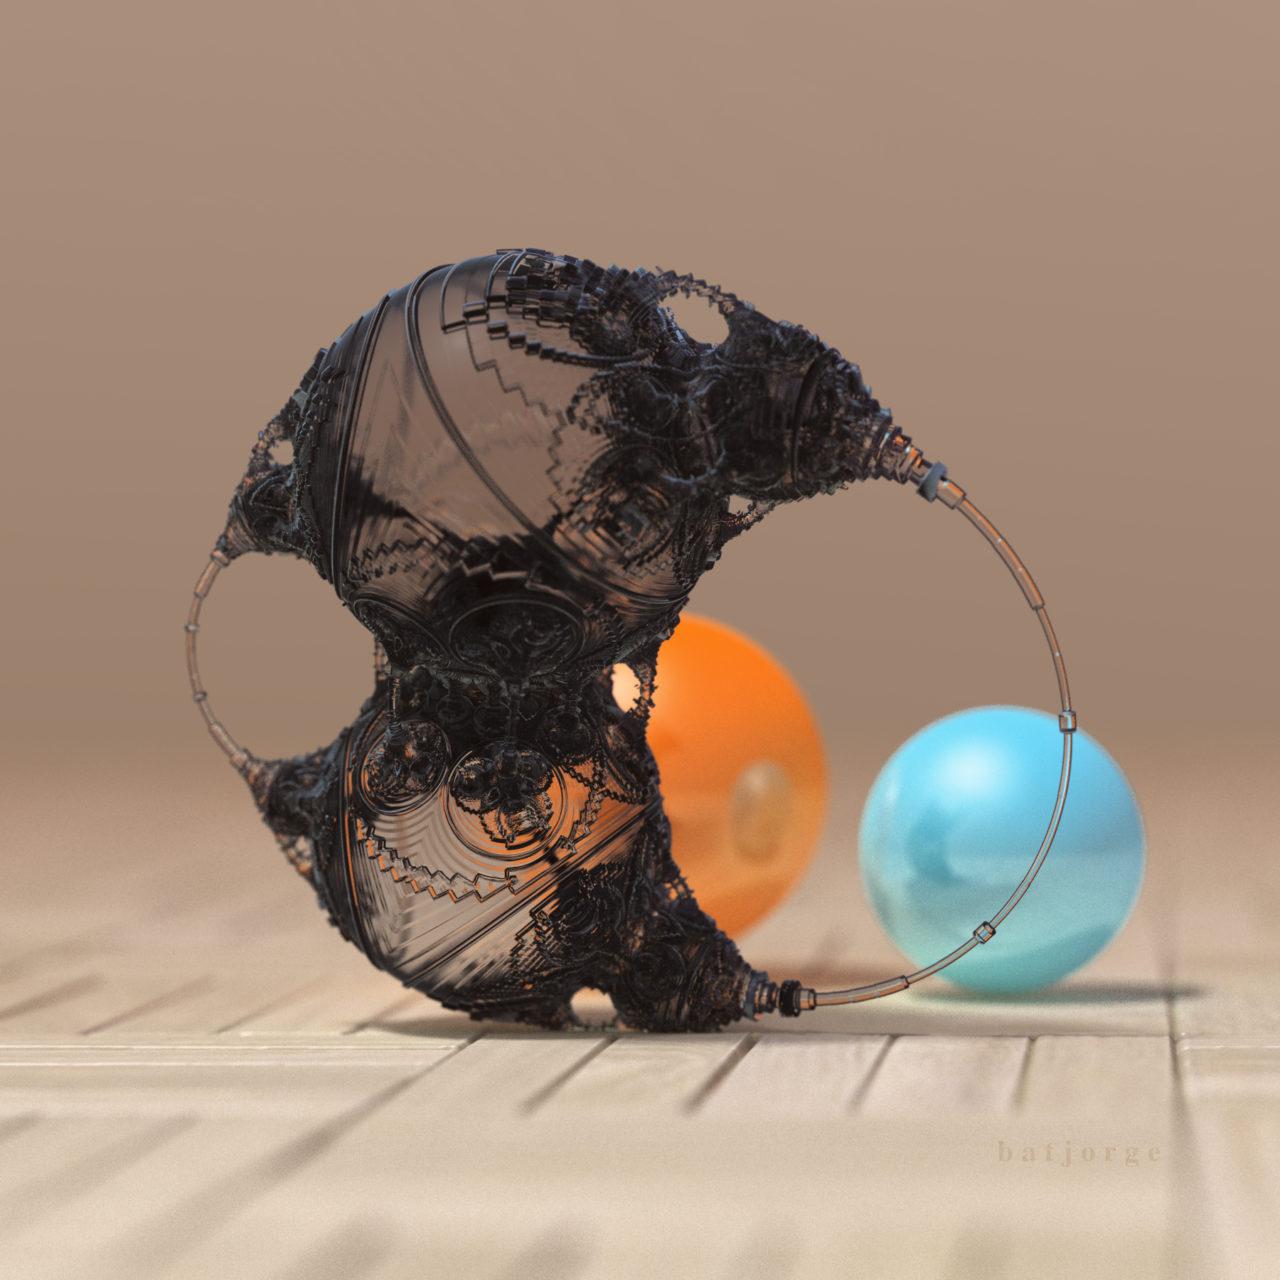 3D mandelbulber amazingsurf mod 4 transparent and spheres